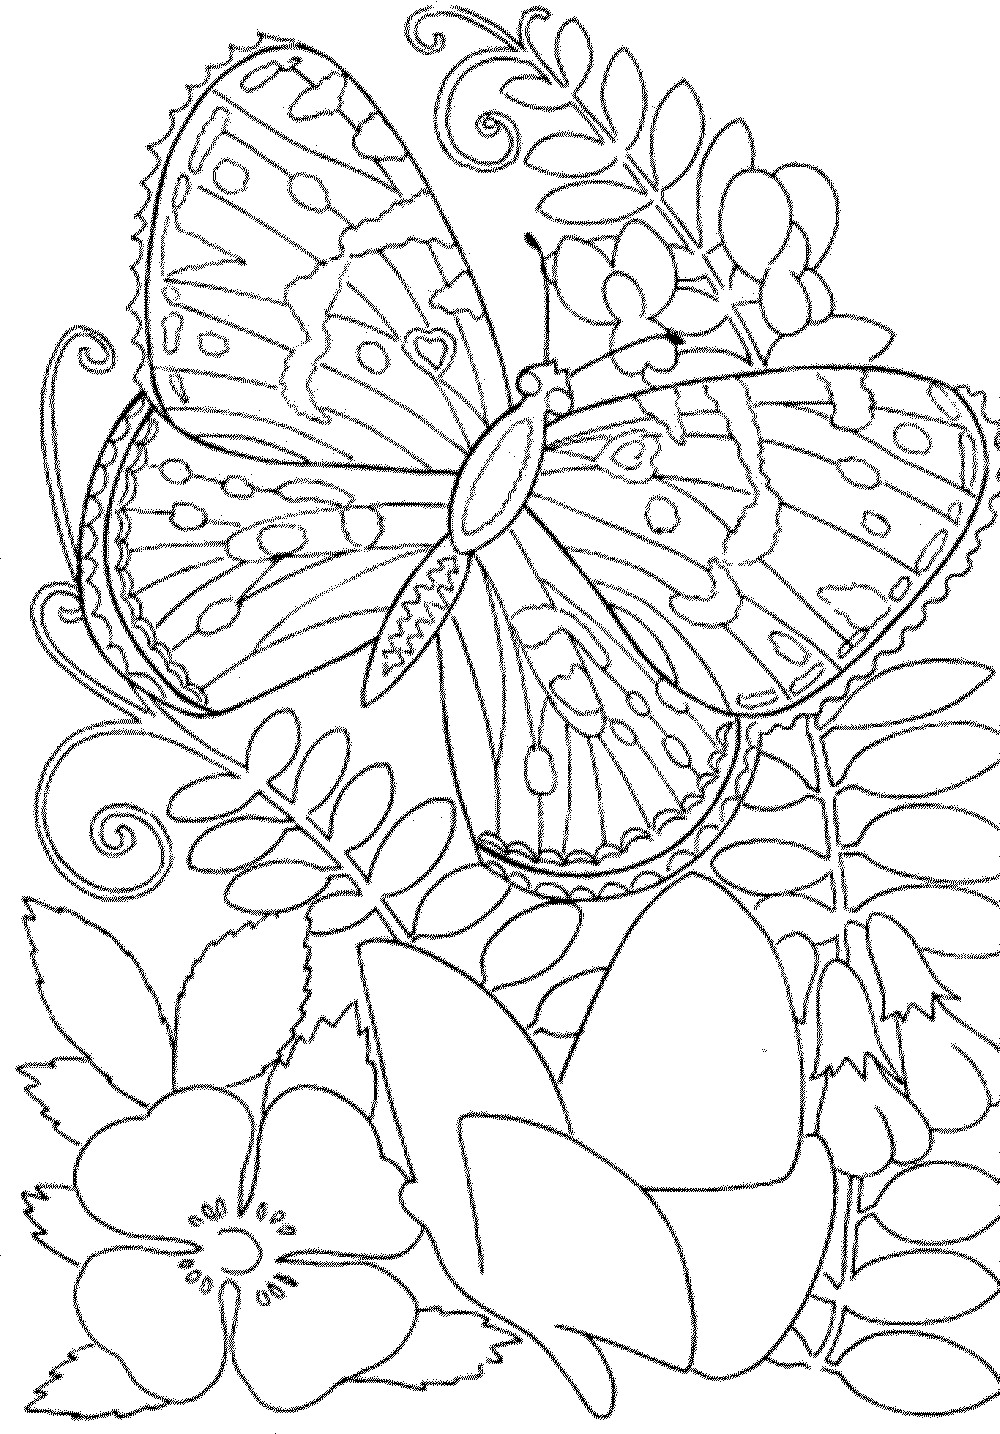 Free Printable Coloring Sheets Adults  Coloring Pages for Adults Free Printable 42 Collections